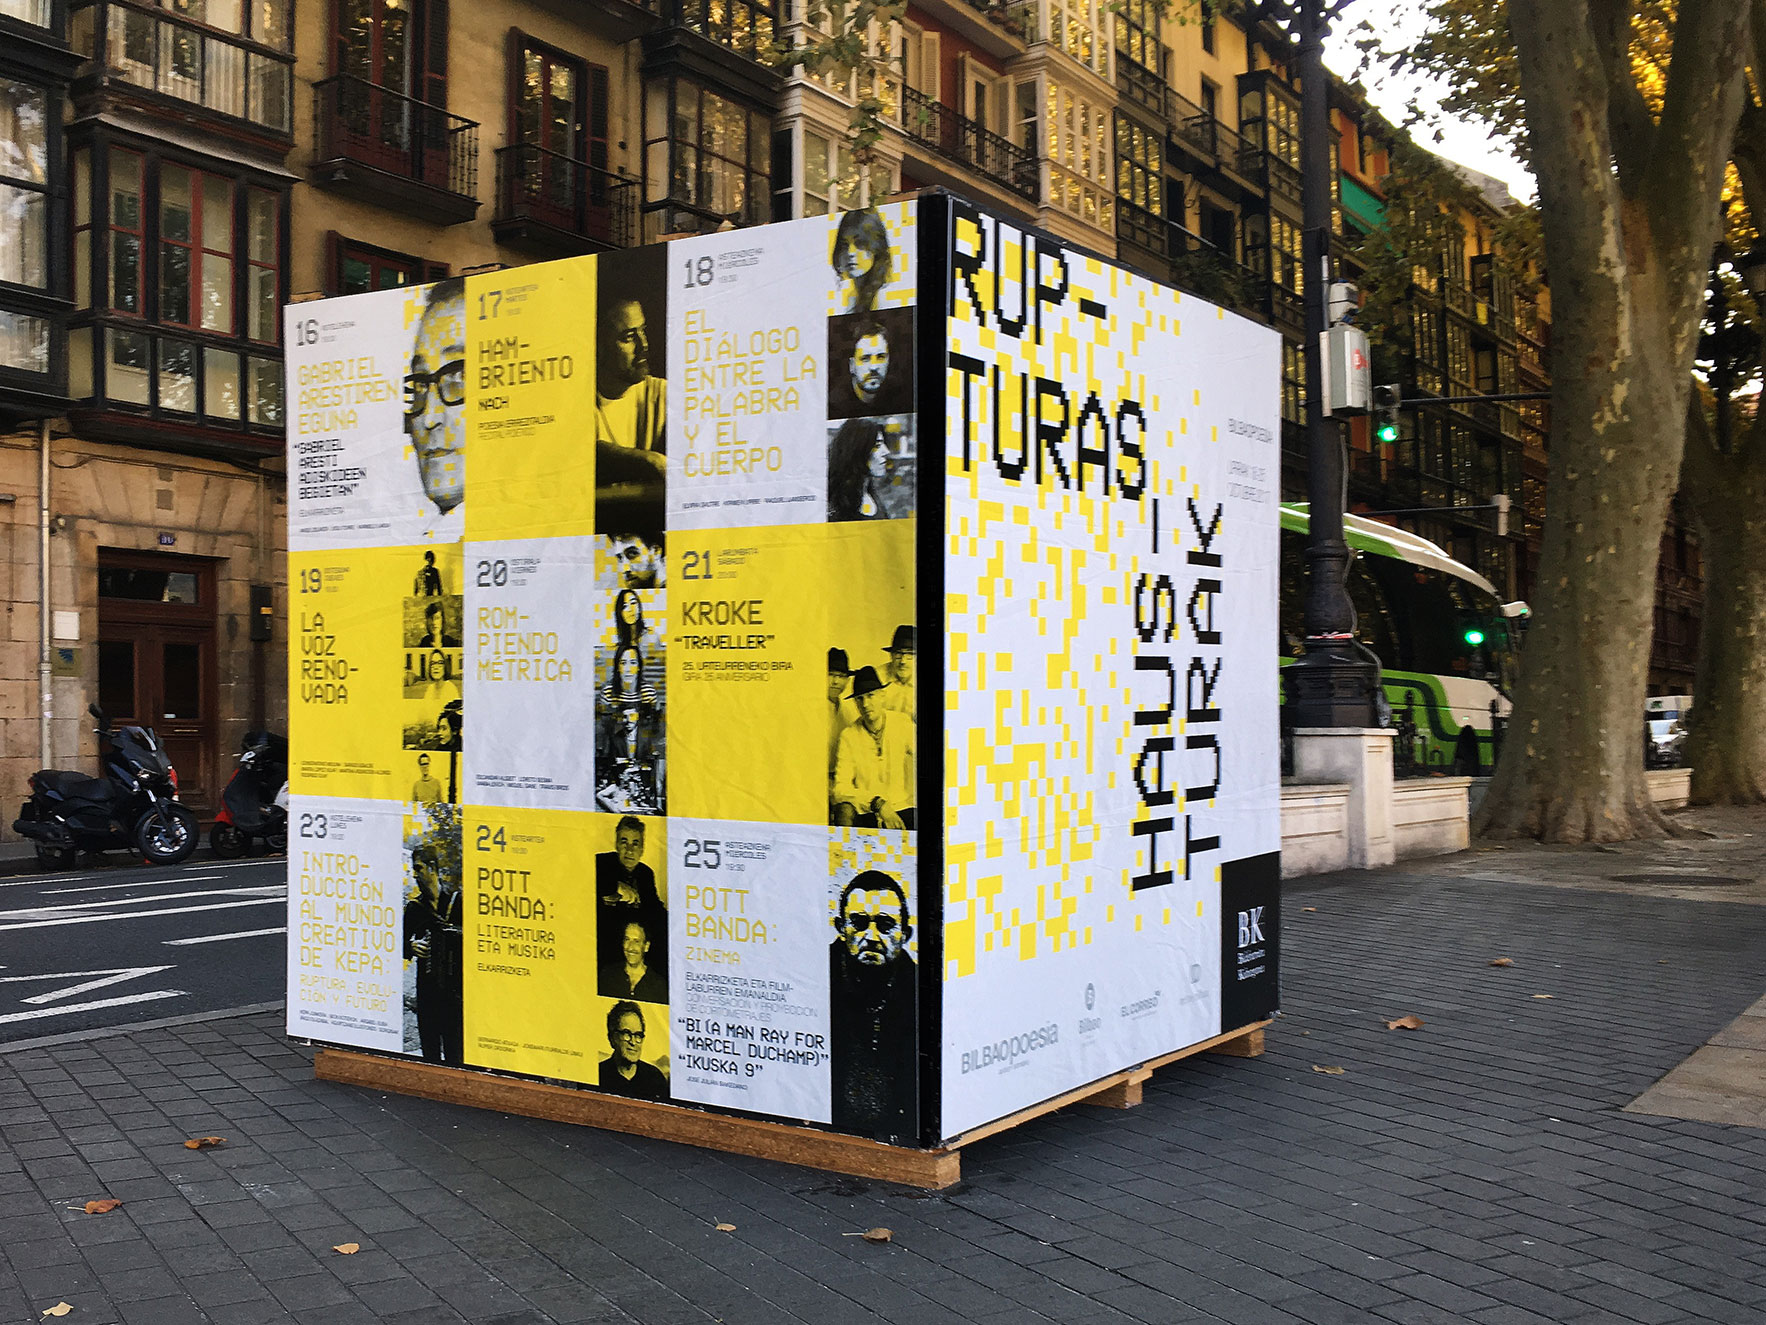 Bilbao poesía calles Bilbao Carteles branding